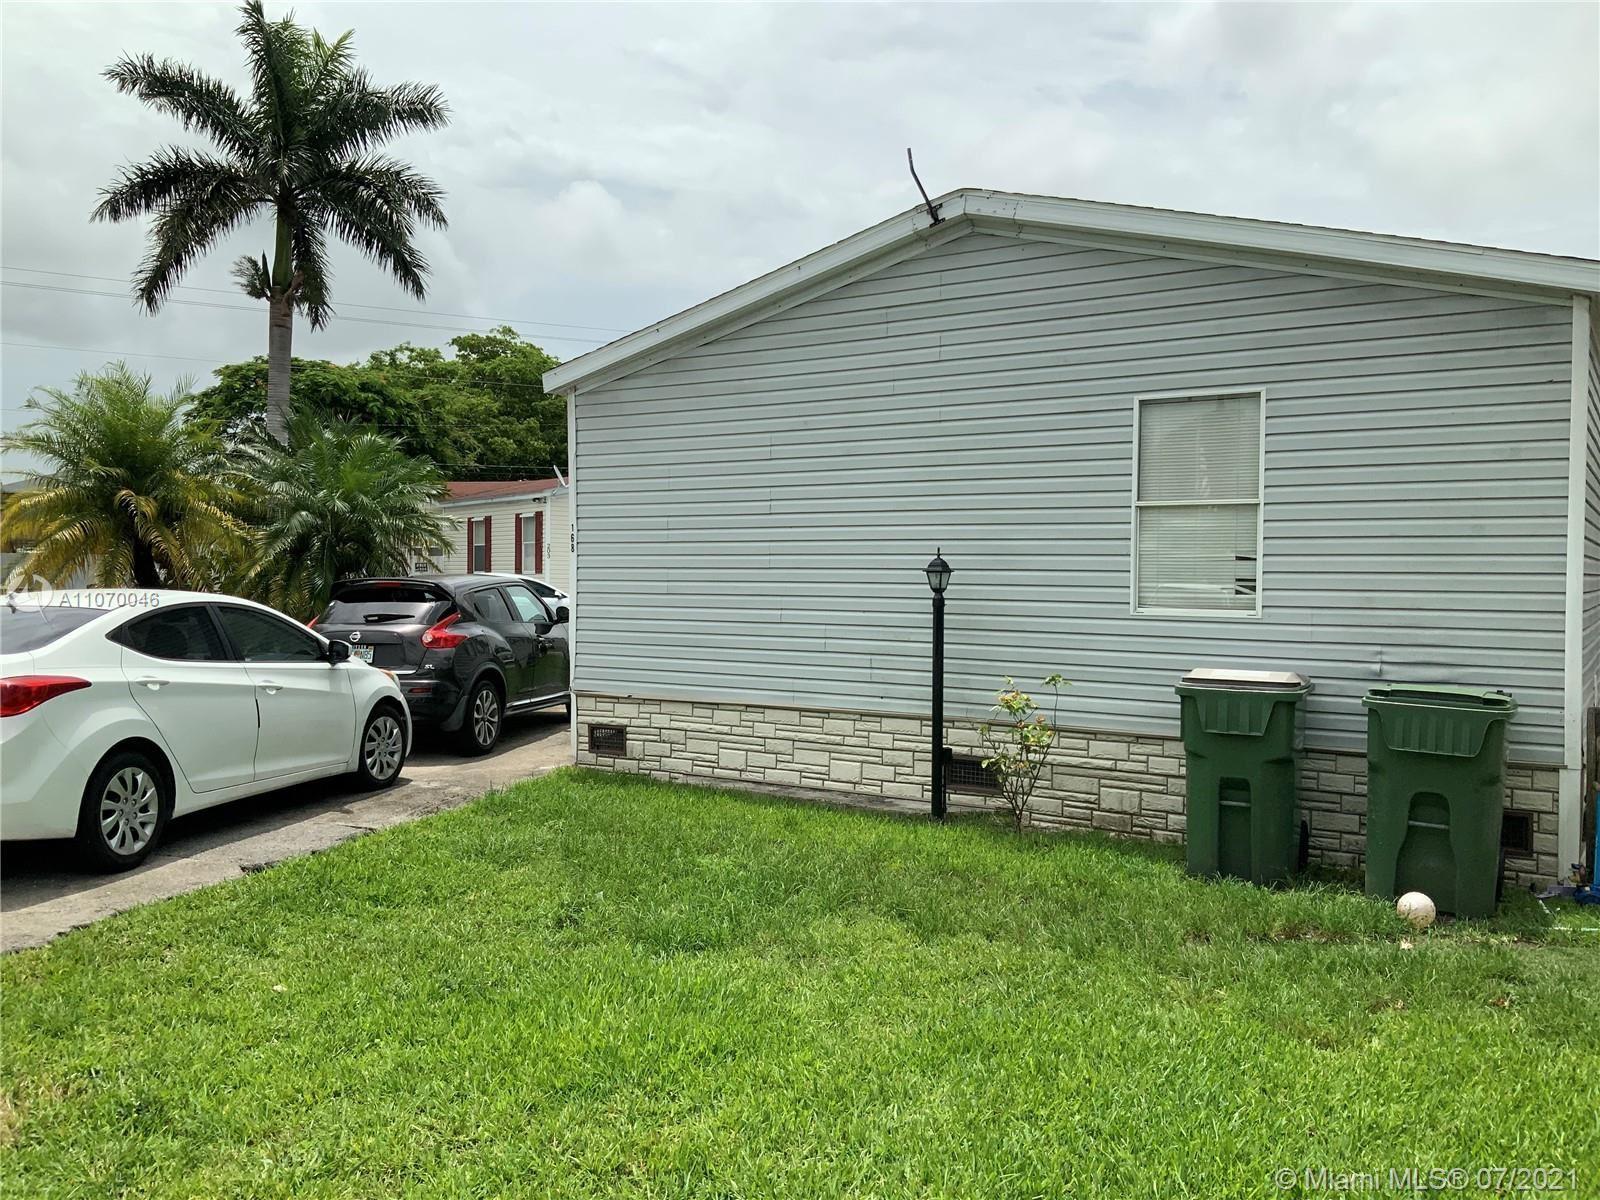 220 NE 12, Homestead, FL 33030 - #: A11070046